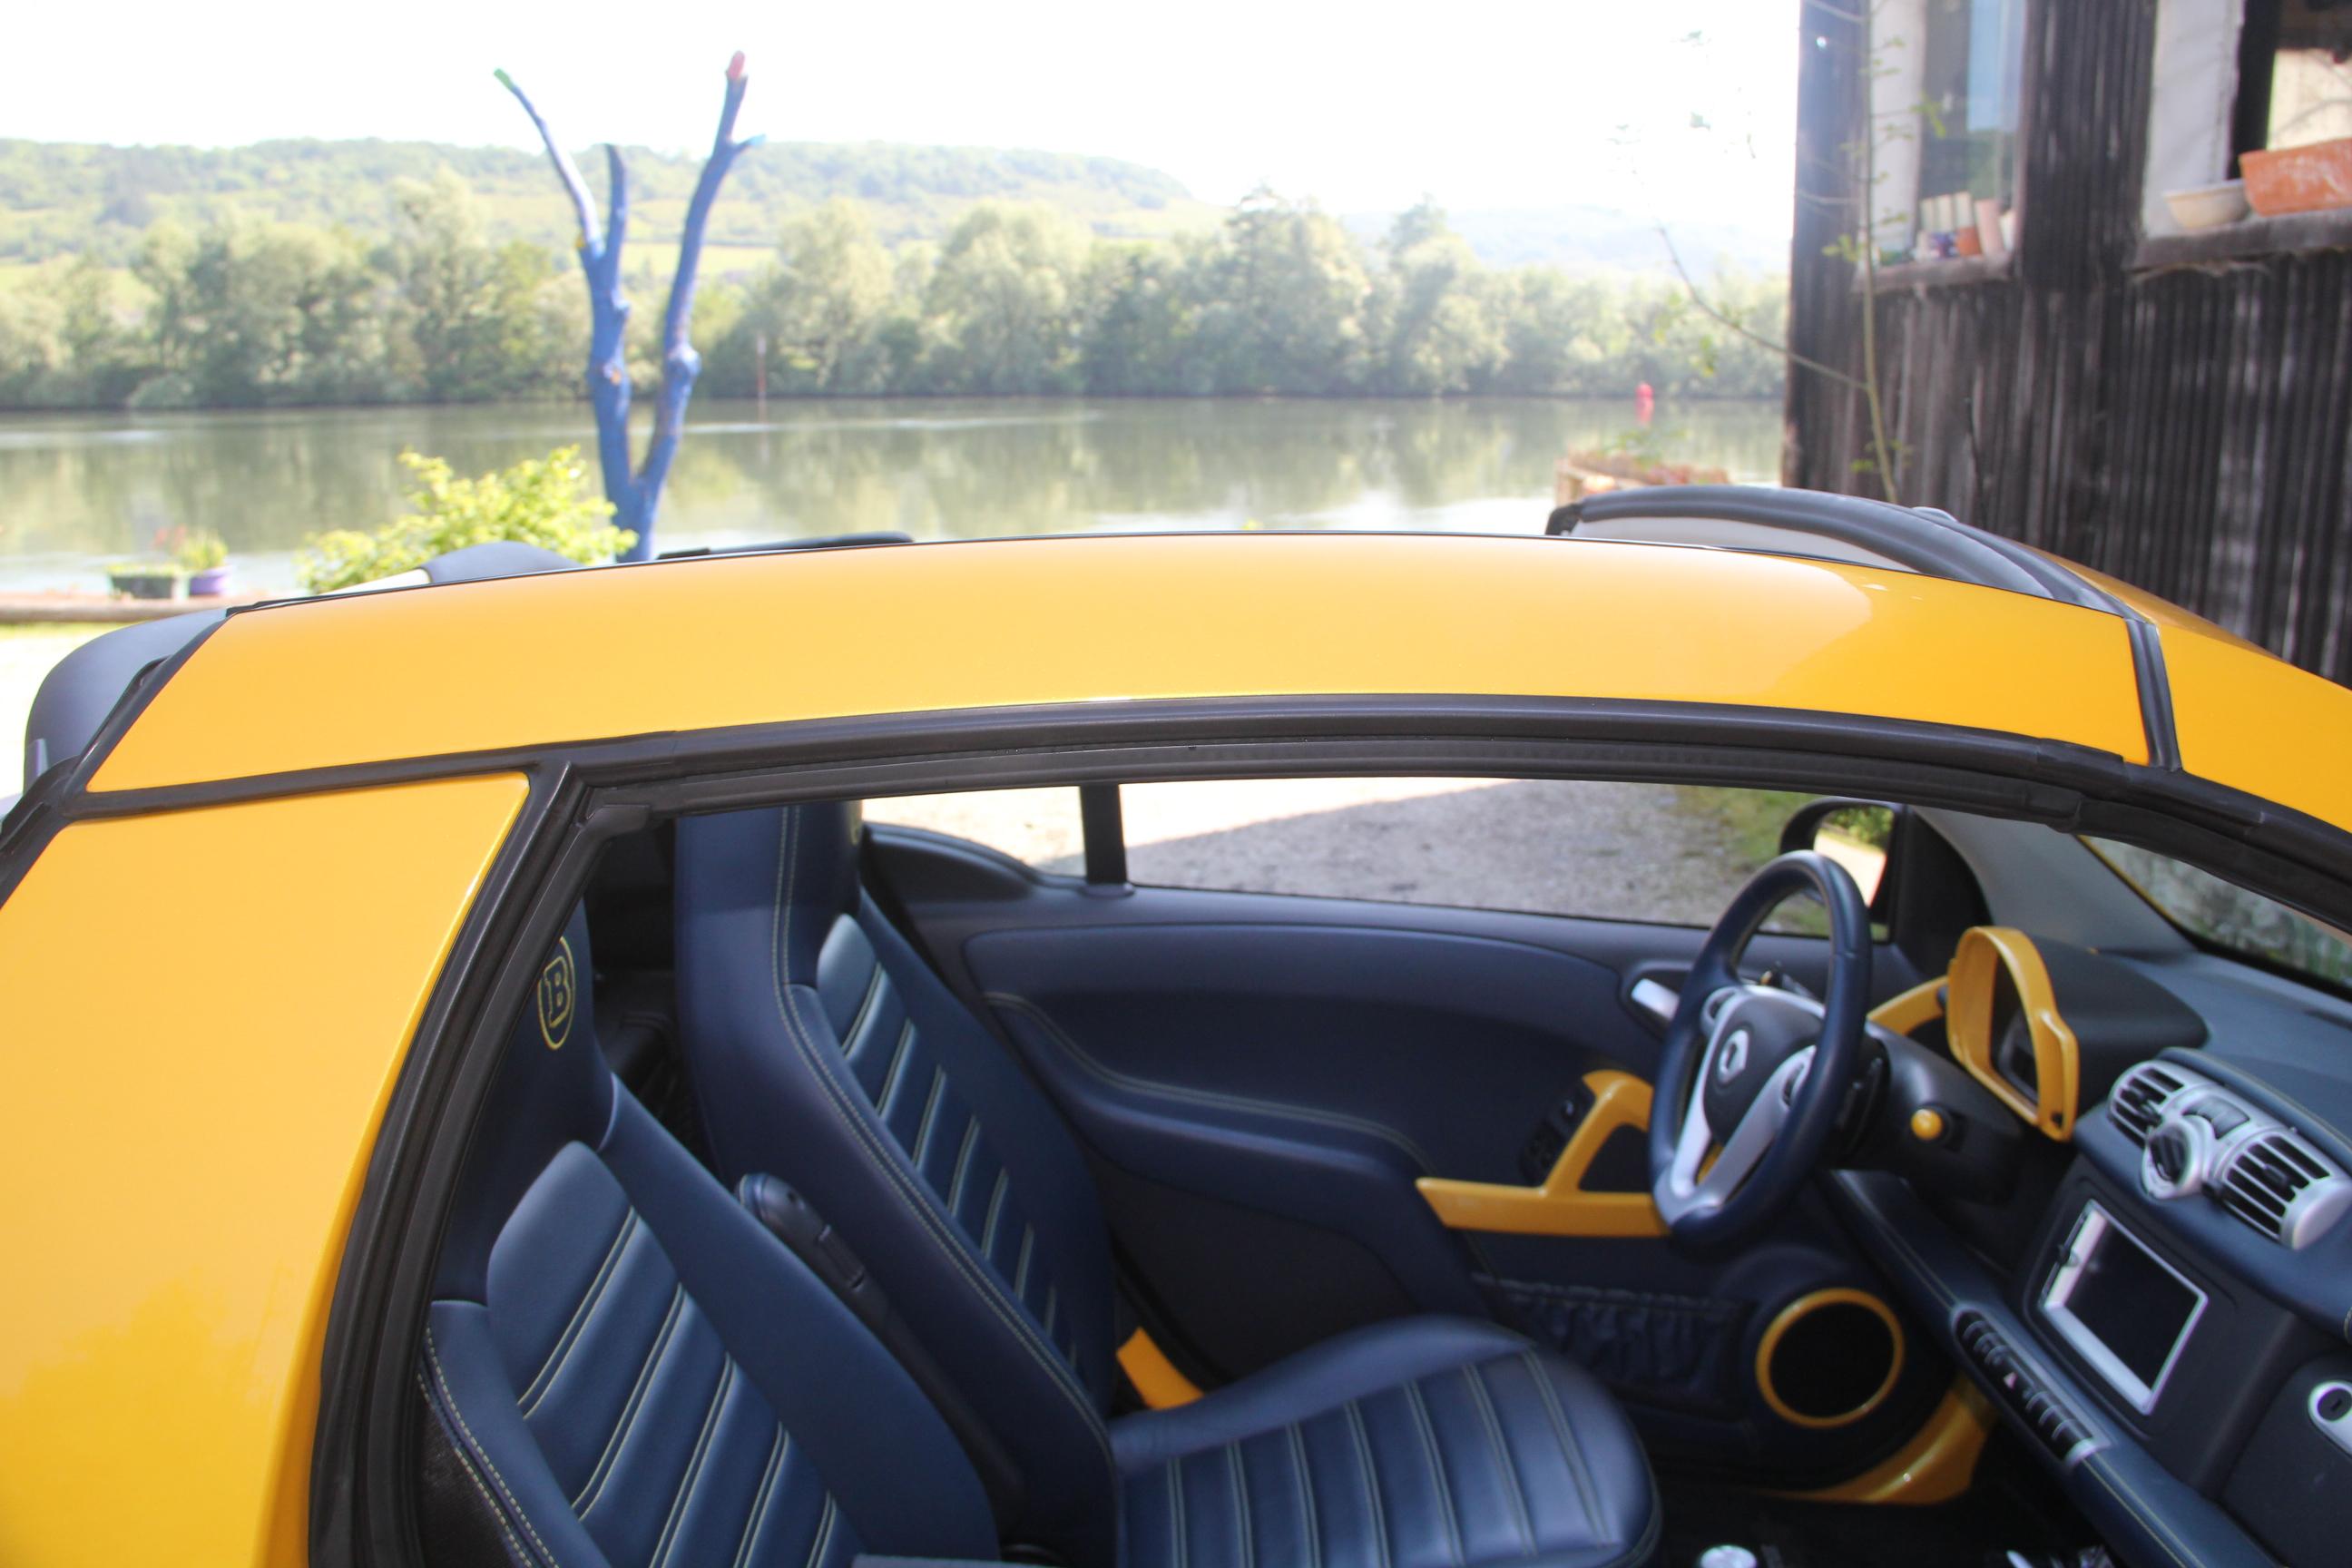 essai smart fortwo mhd cabriolet cab 39 de poche. Black Bedroom Furniture Sets. Home Design Ideas